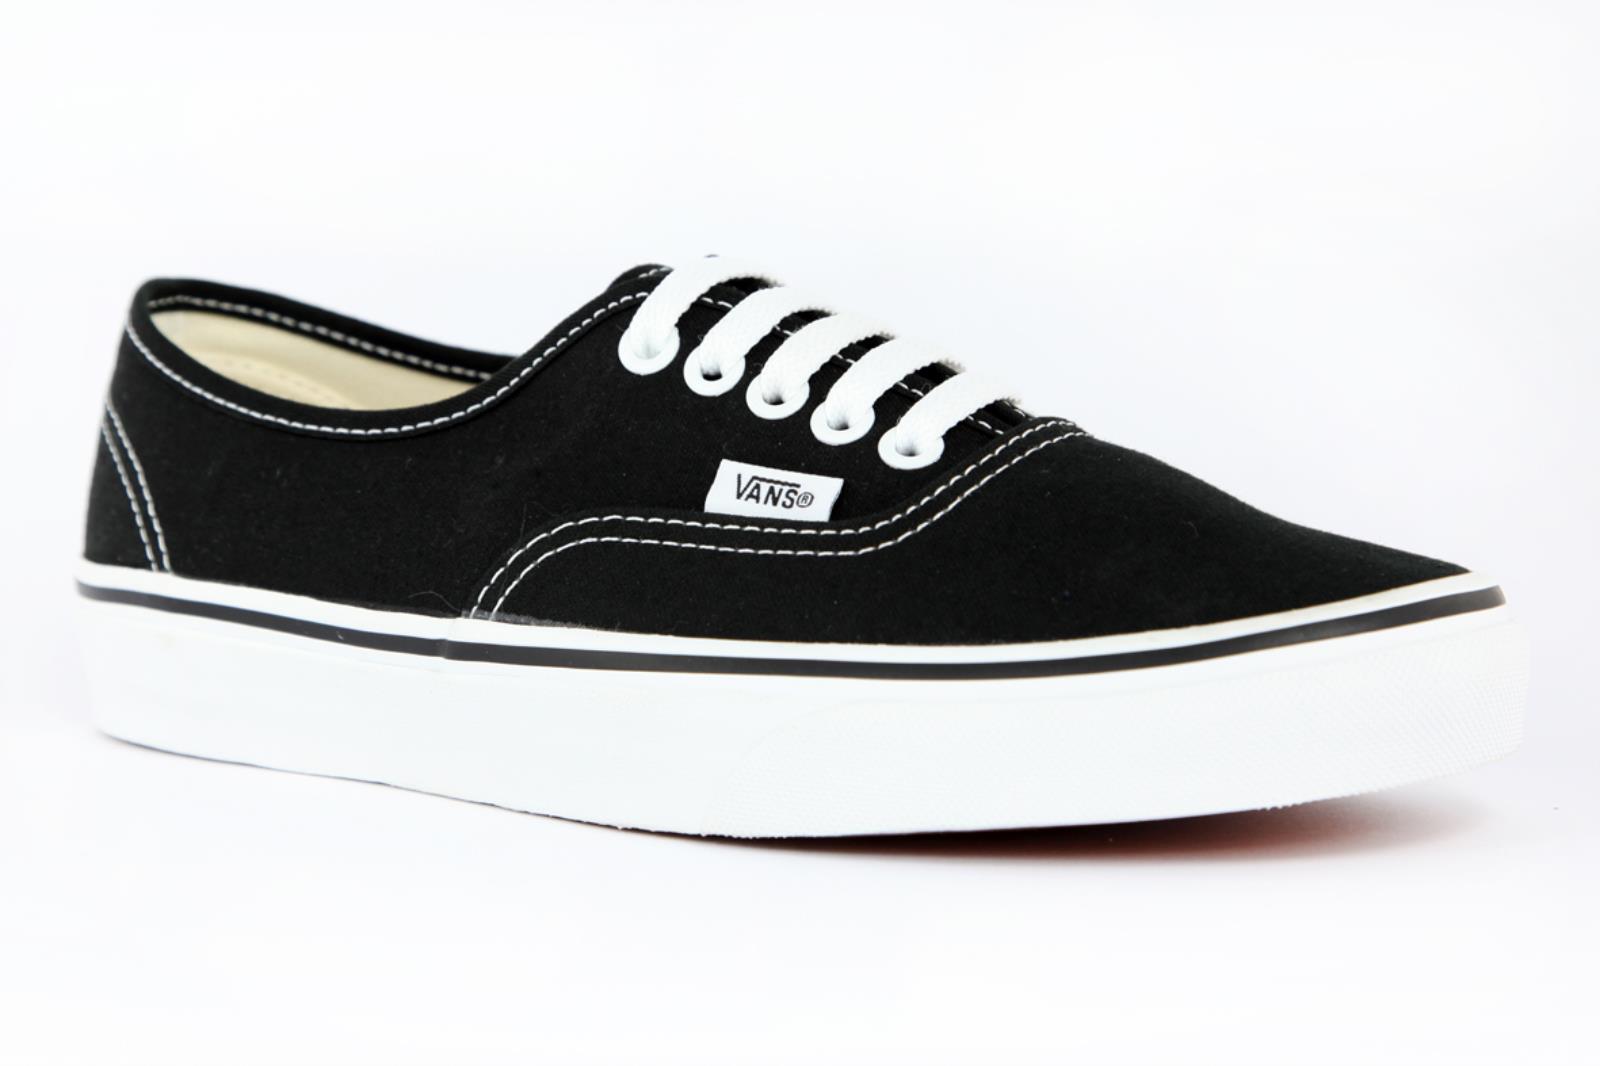 Vans Authentic Tela Nera Unisex Skate Sneakers